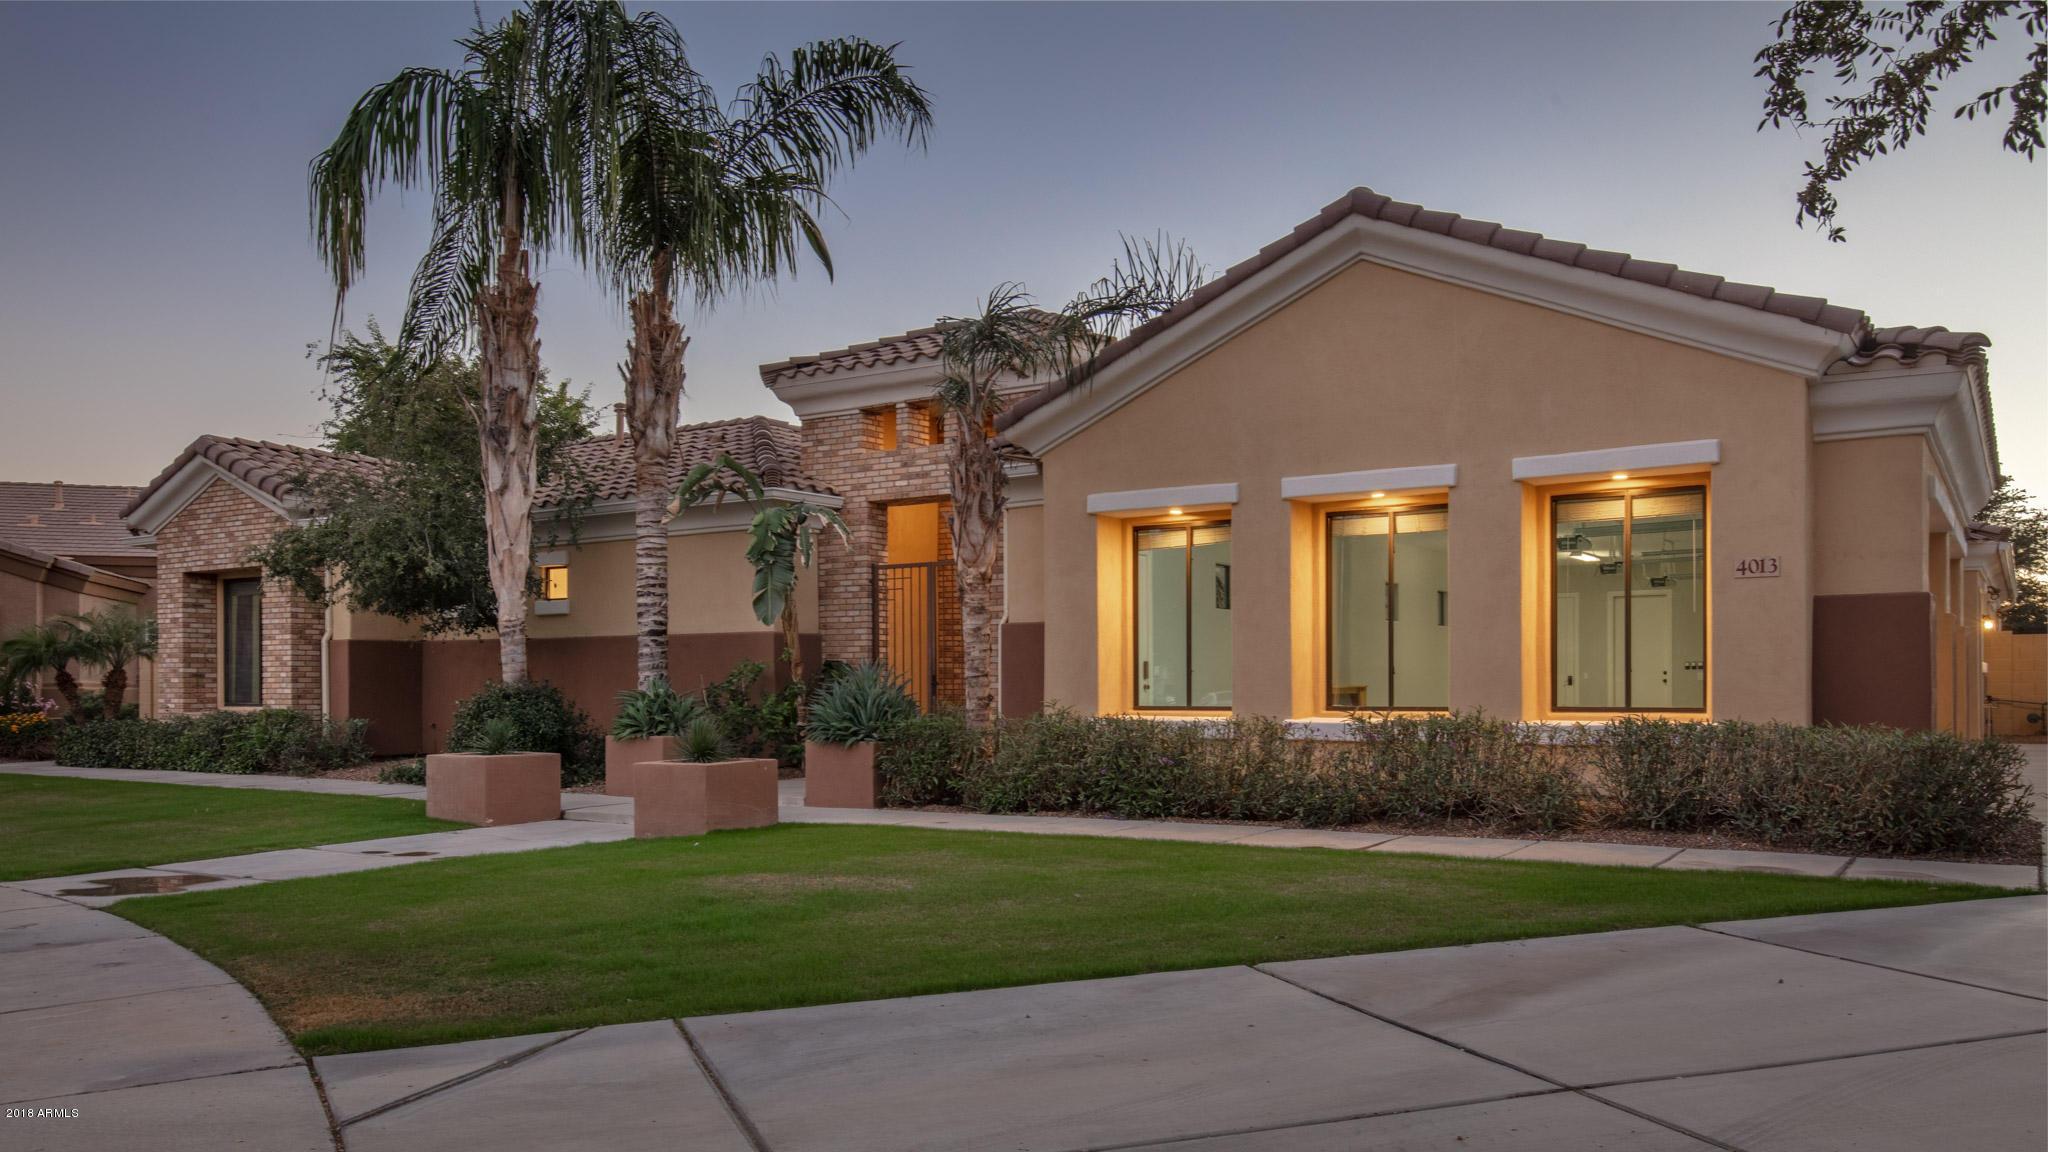 Photo of 4013 E SCORPIO Place, Chandler, AZ 85249